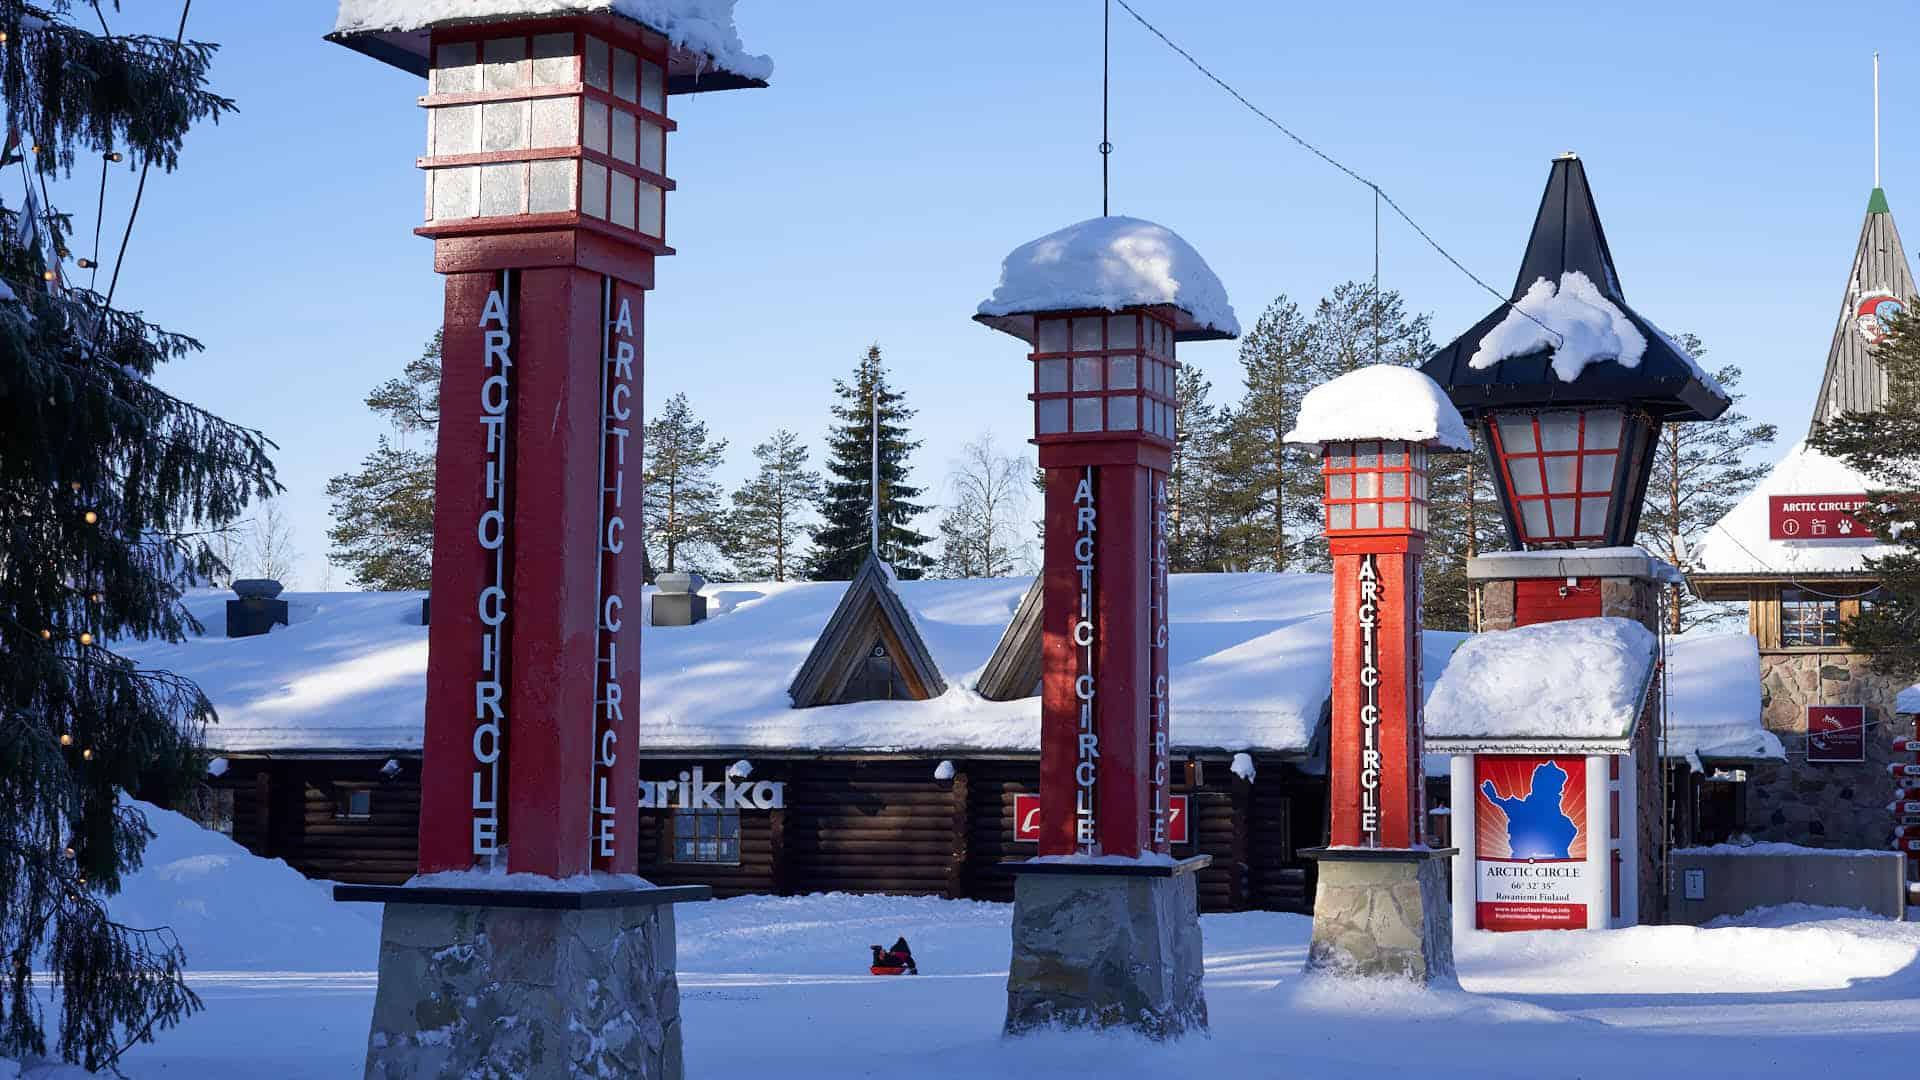 The Artic Circle in the Santa Claus Village in Rovaniemi